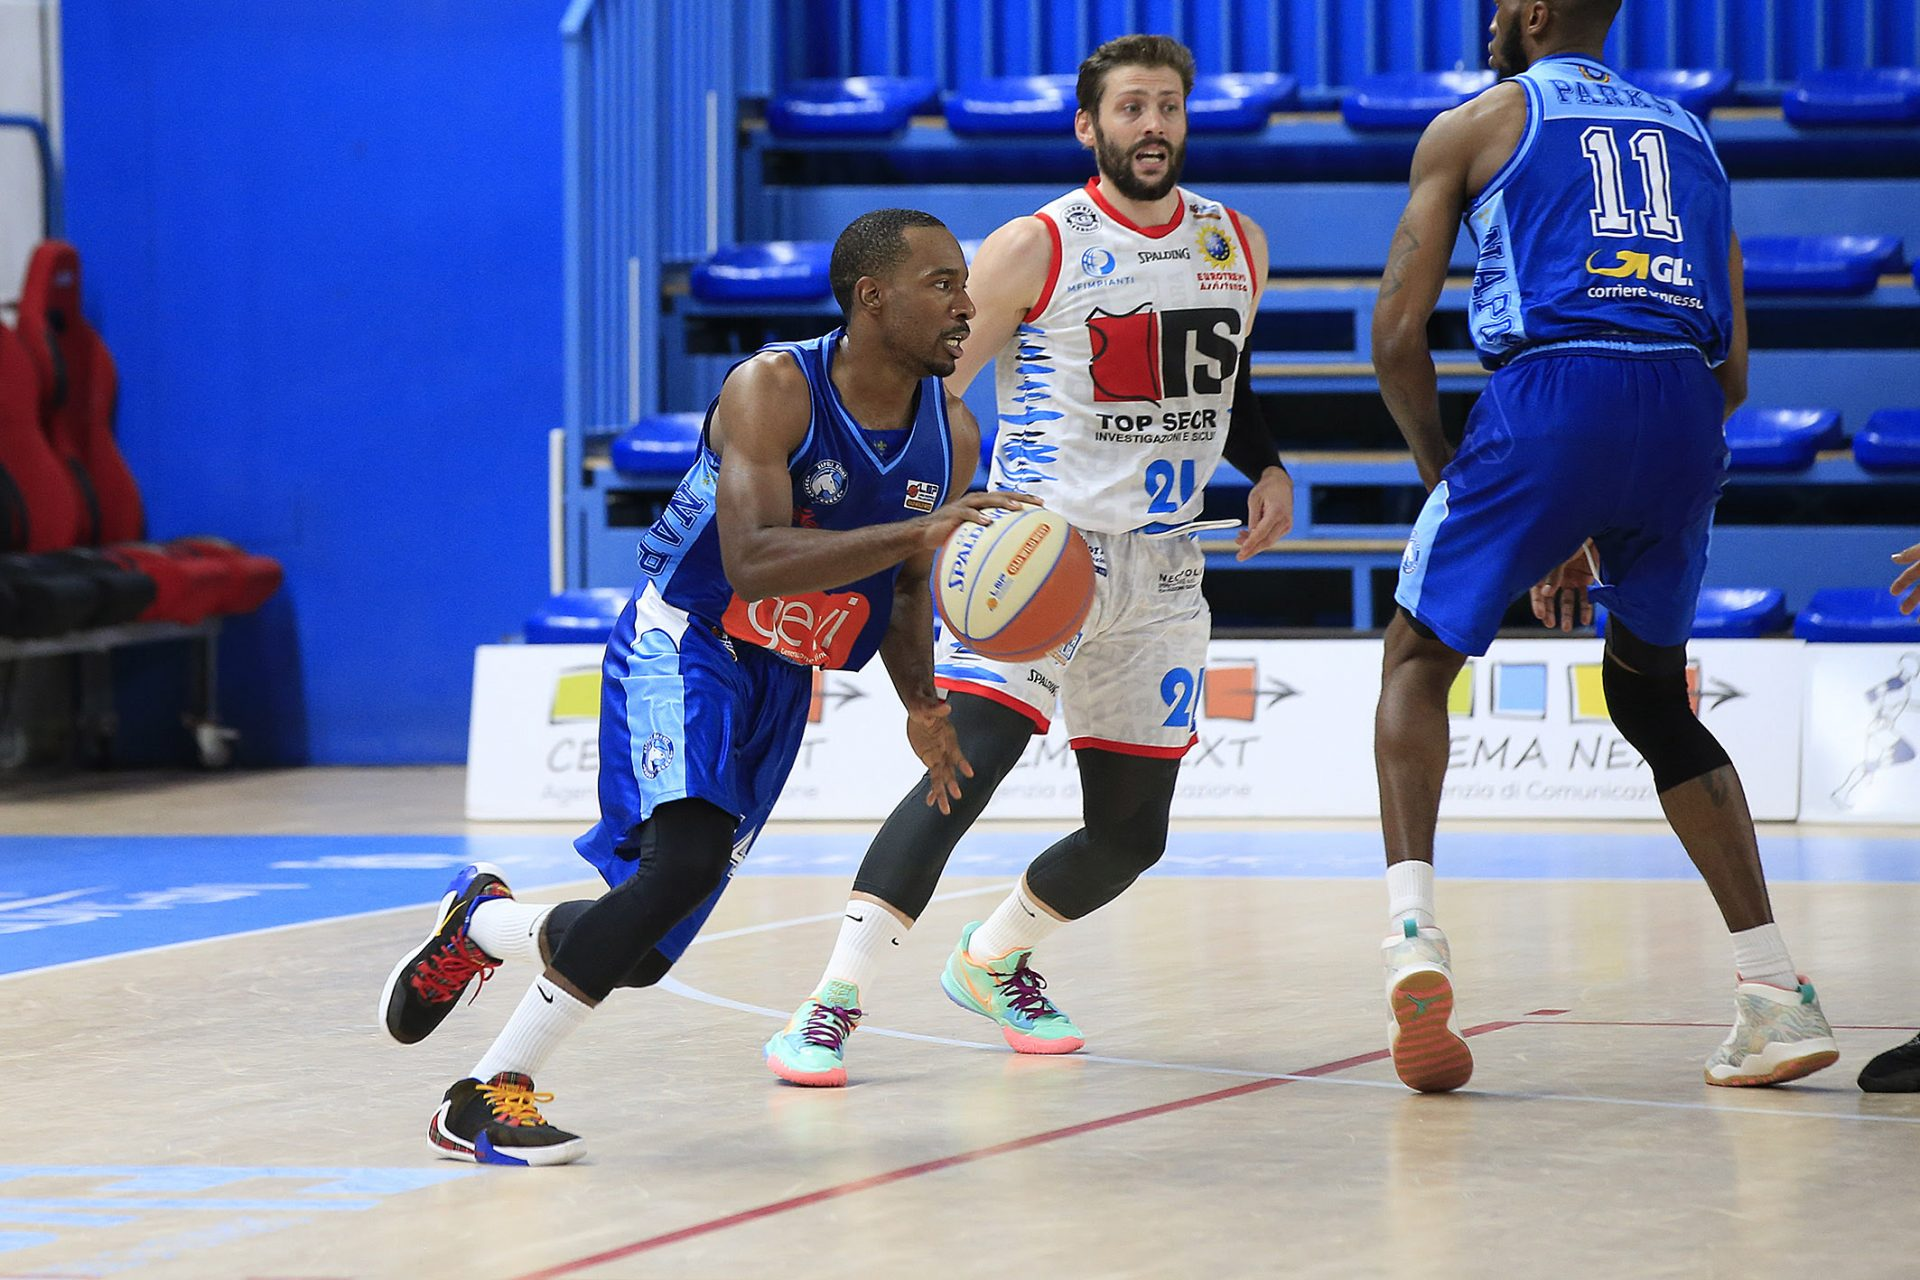 Basket, gli azzurri sono in finale: Top Secret Ferrara-Gevi Napoli Basket 79-88